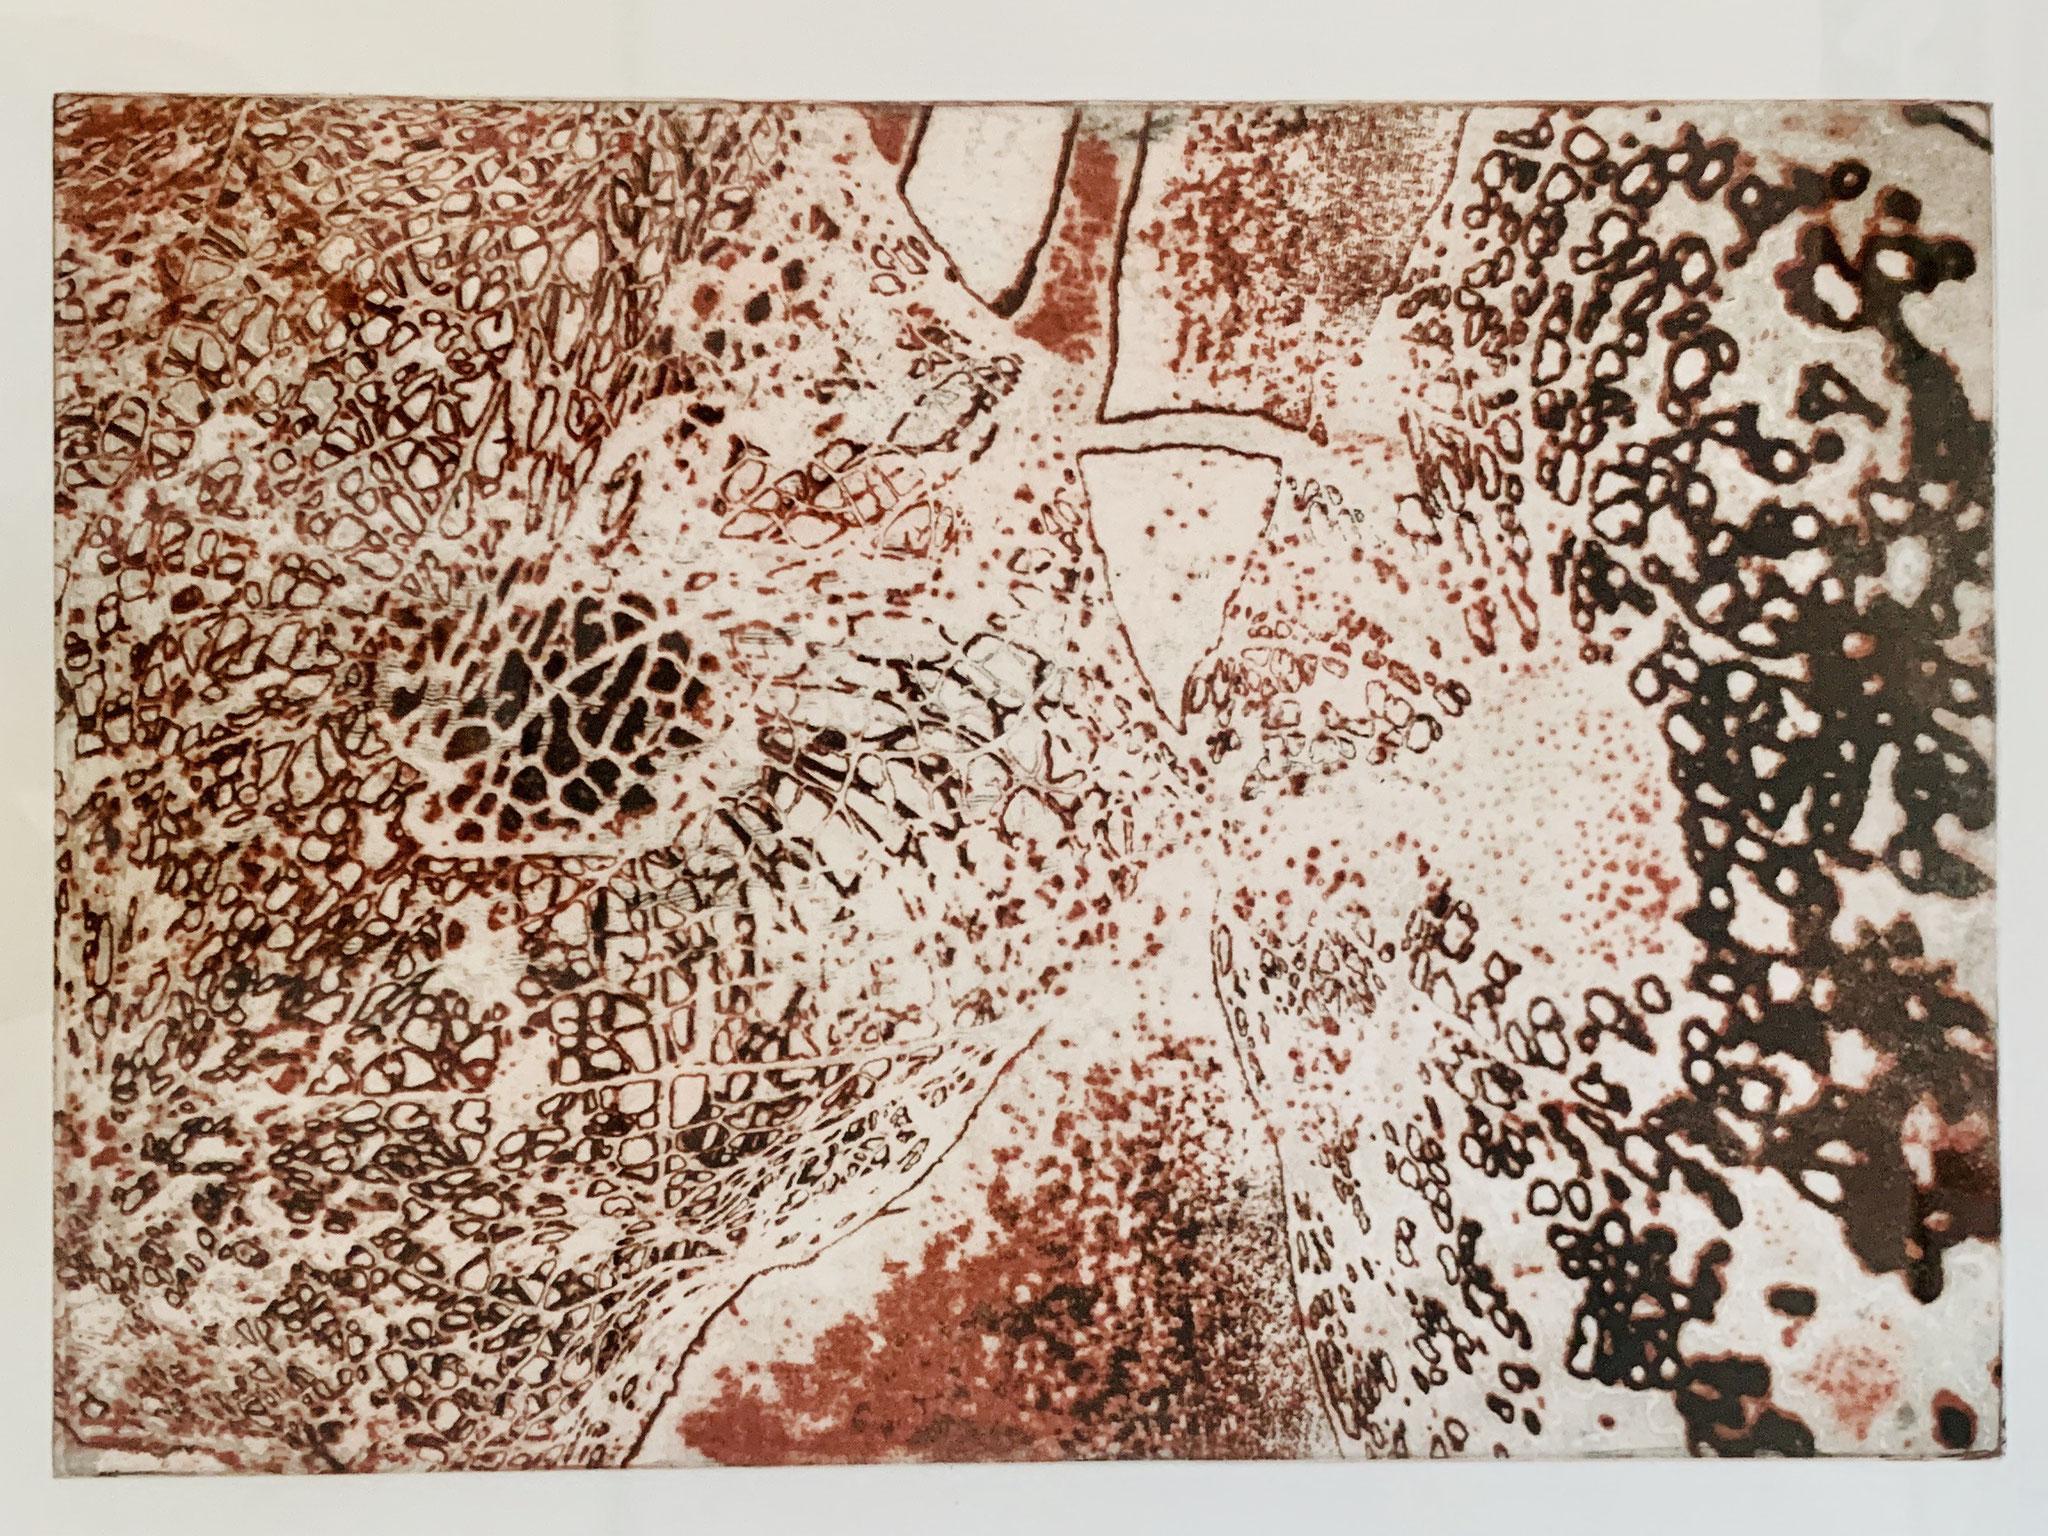 51. Sabina Potthoff, Physalis I, Intagliotypie auf Bütten-Kupferdruckkarton, 400 x 560 mm, 2018, 500 €